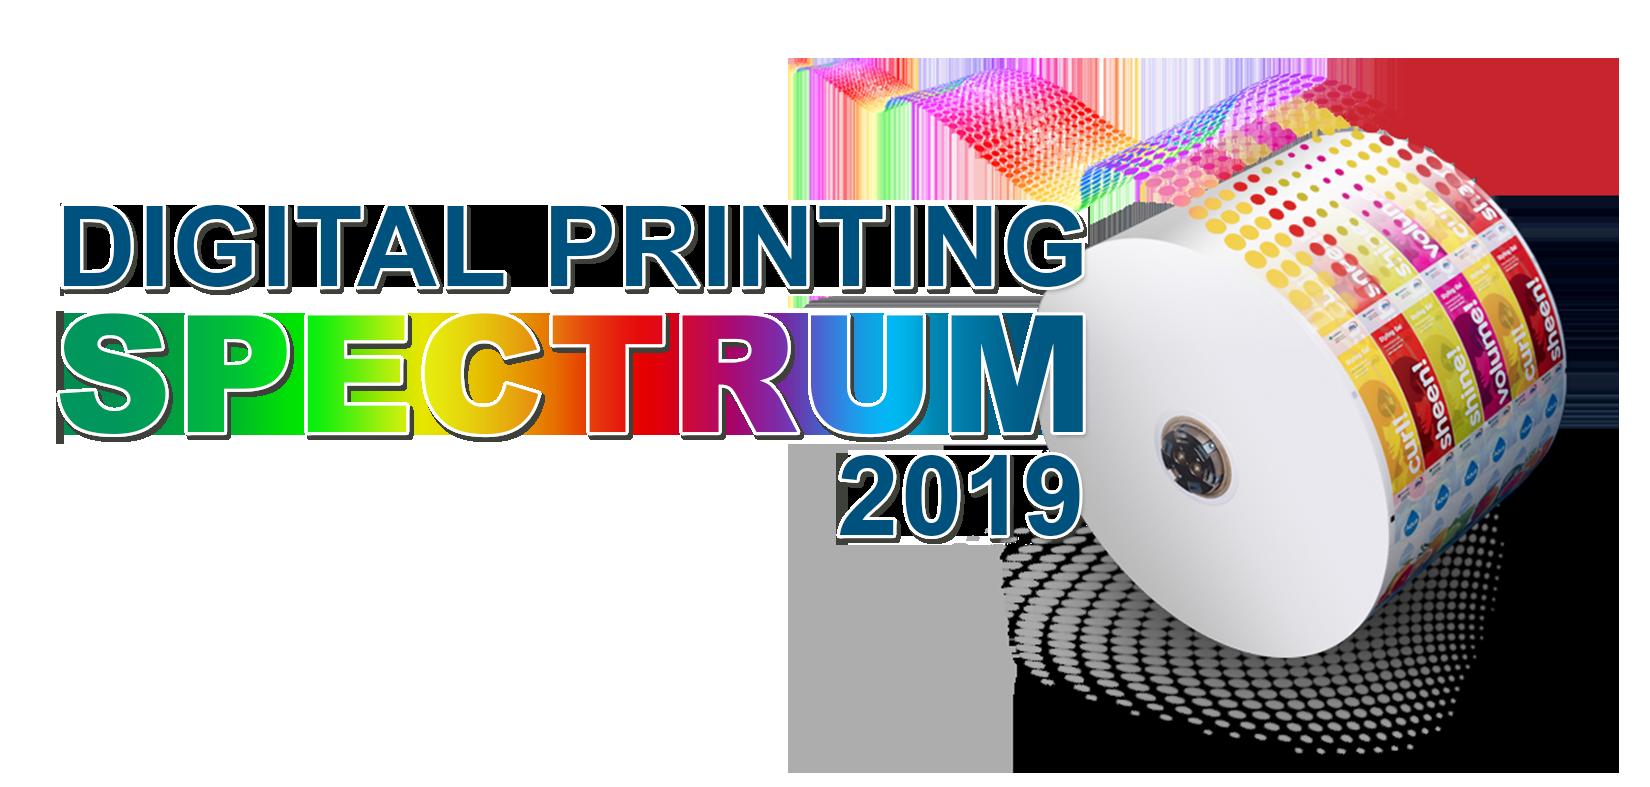 Domino Digital Printing Spectrum 2019